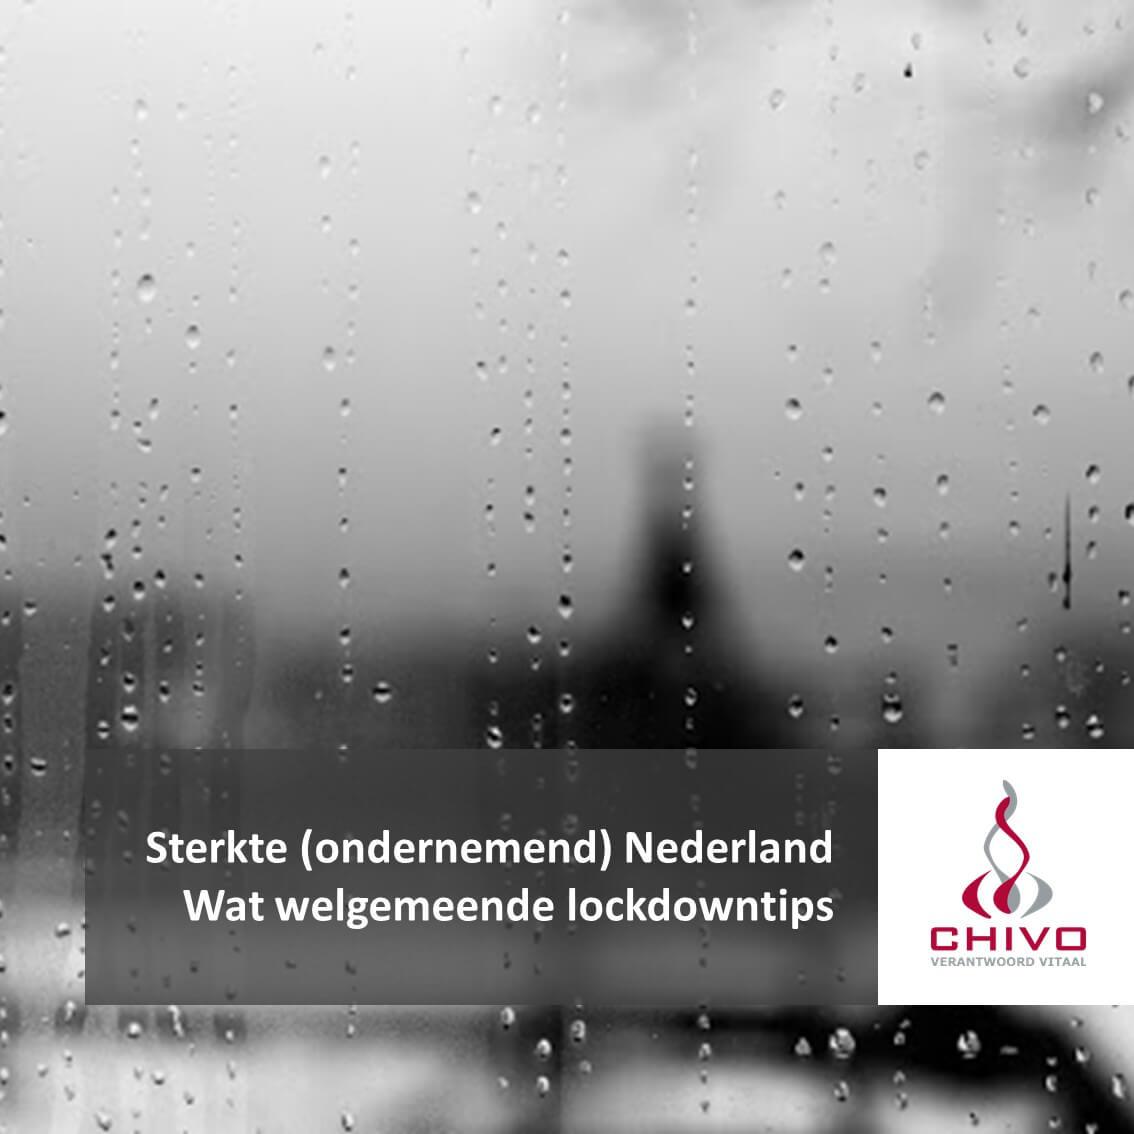 Sterkte (ondernemend) Nederland lockdowntips